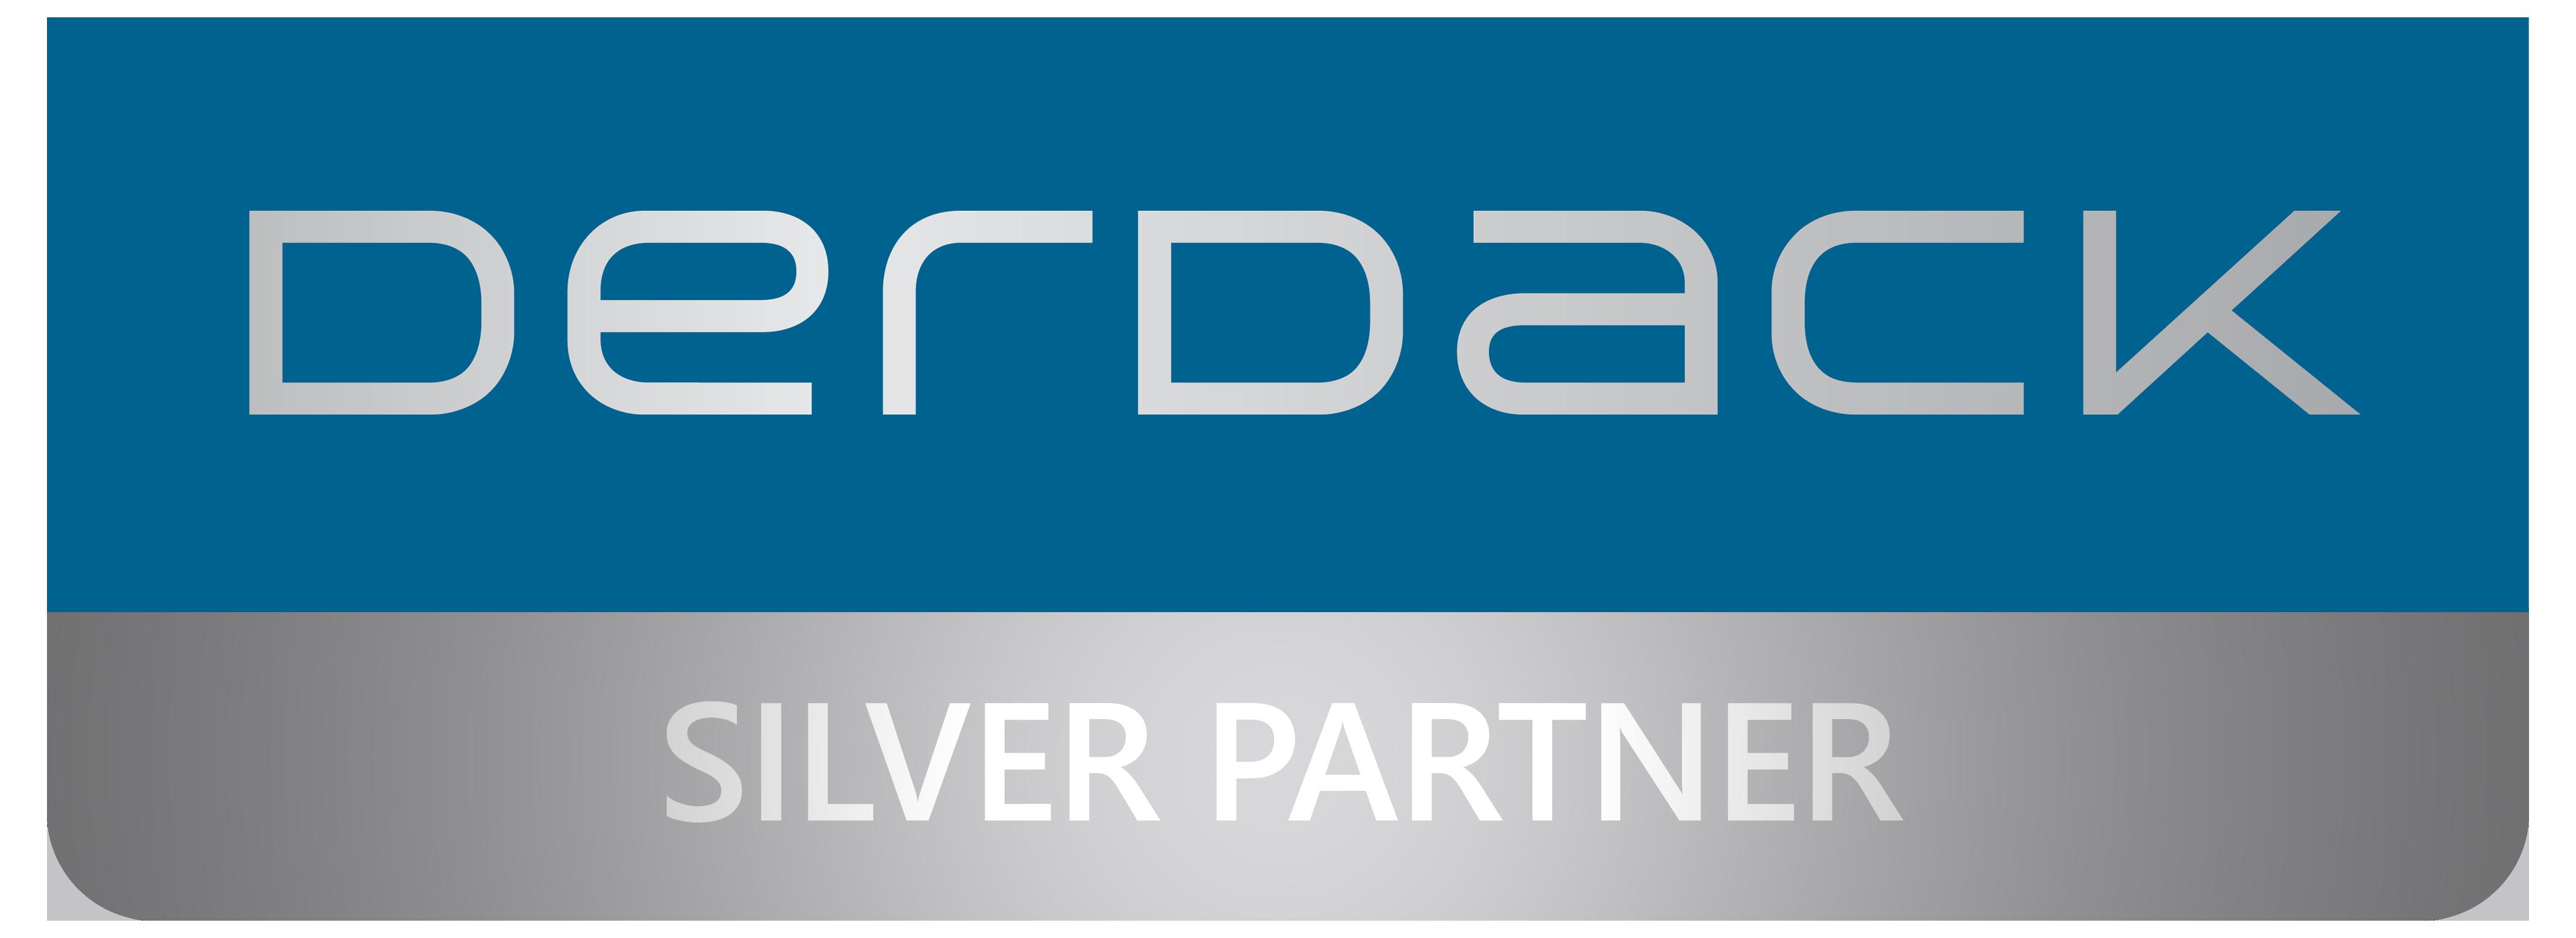 Partnerlogos_2021_silver_glossy